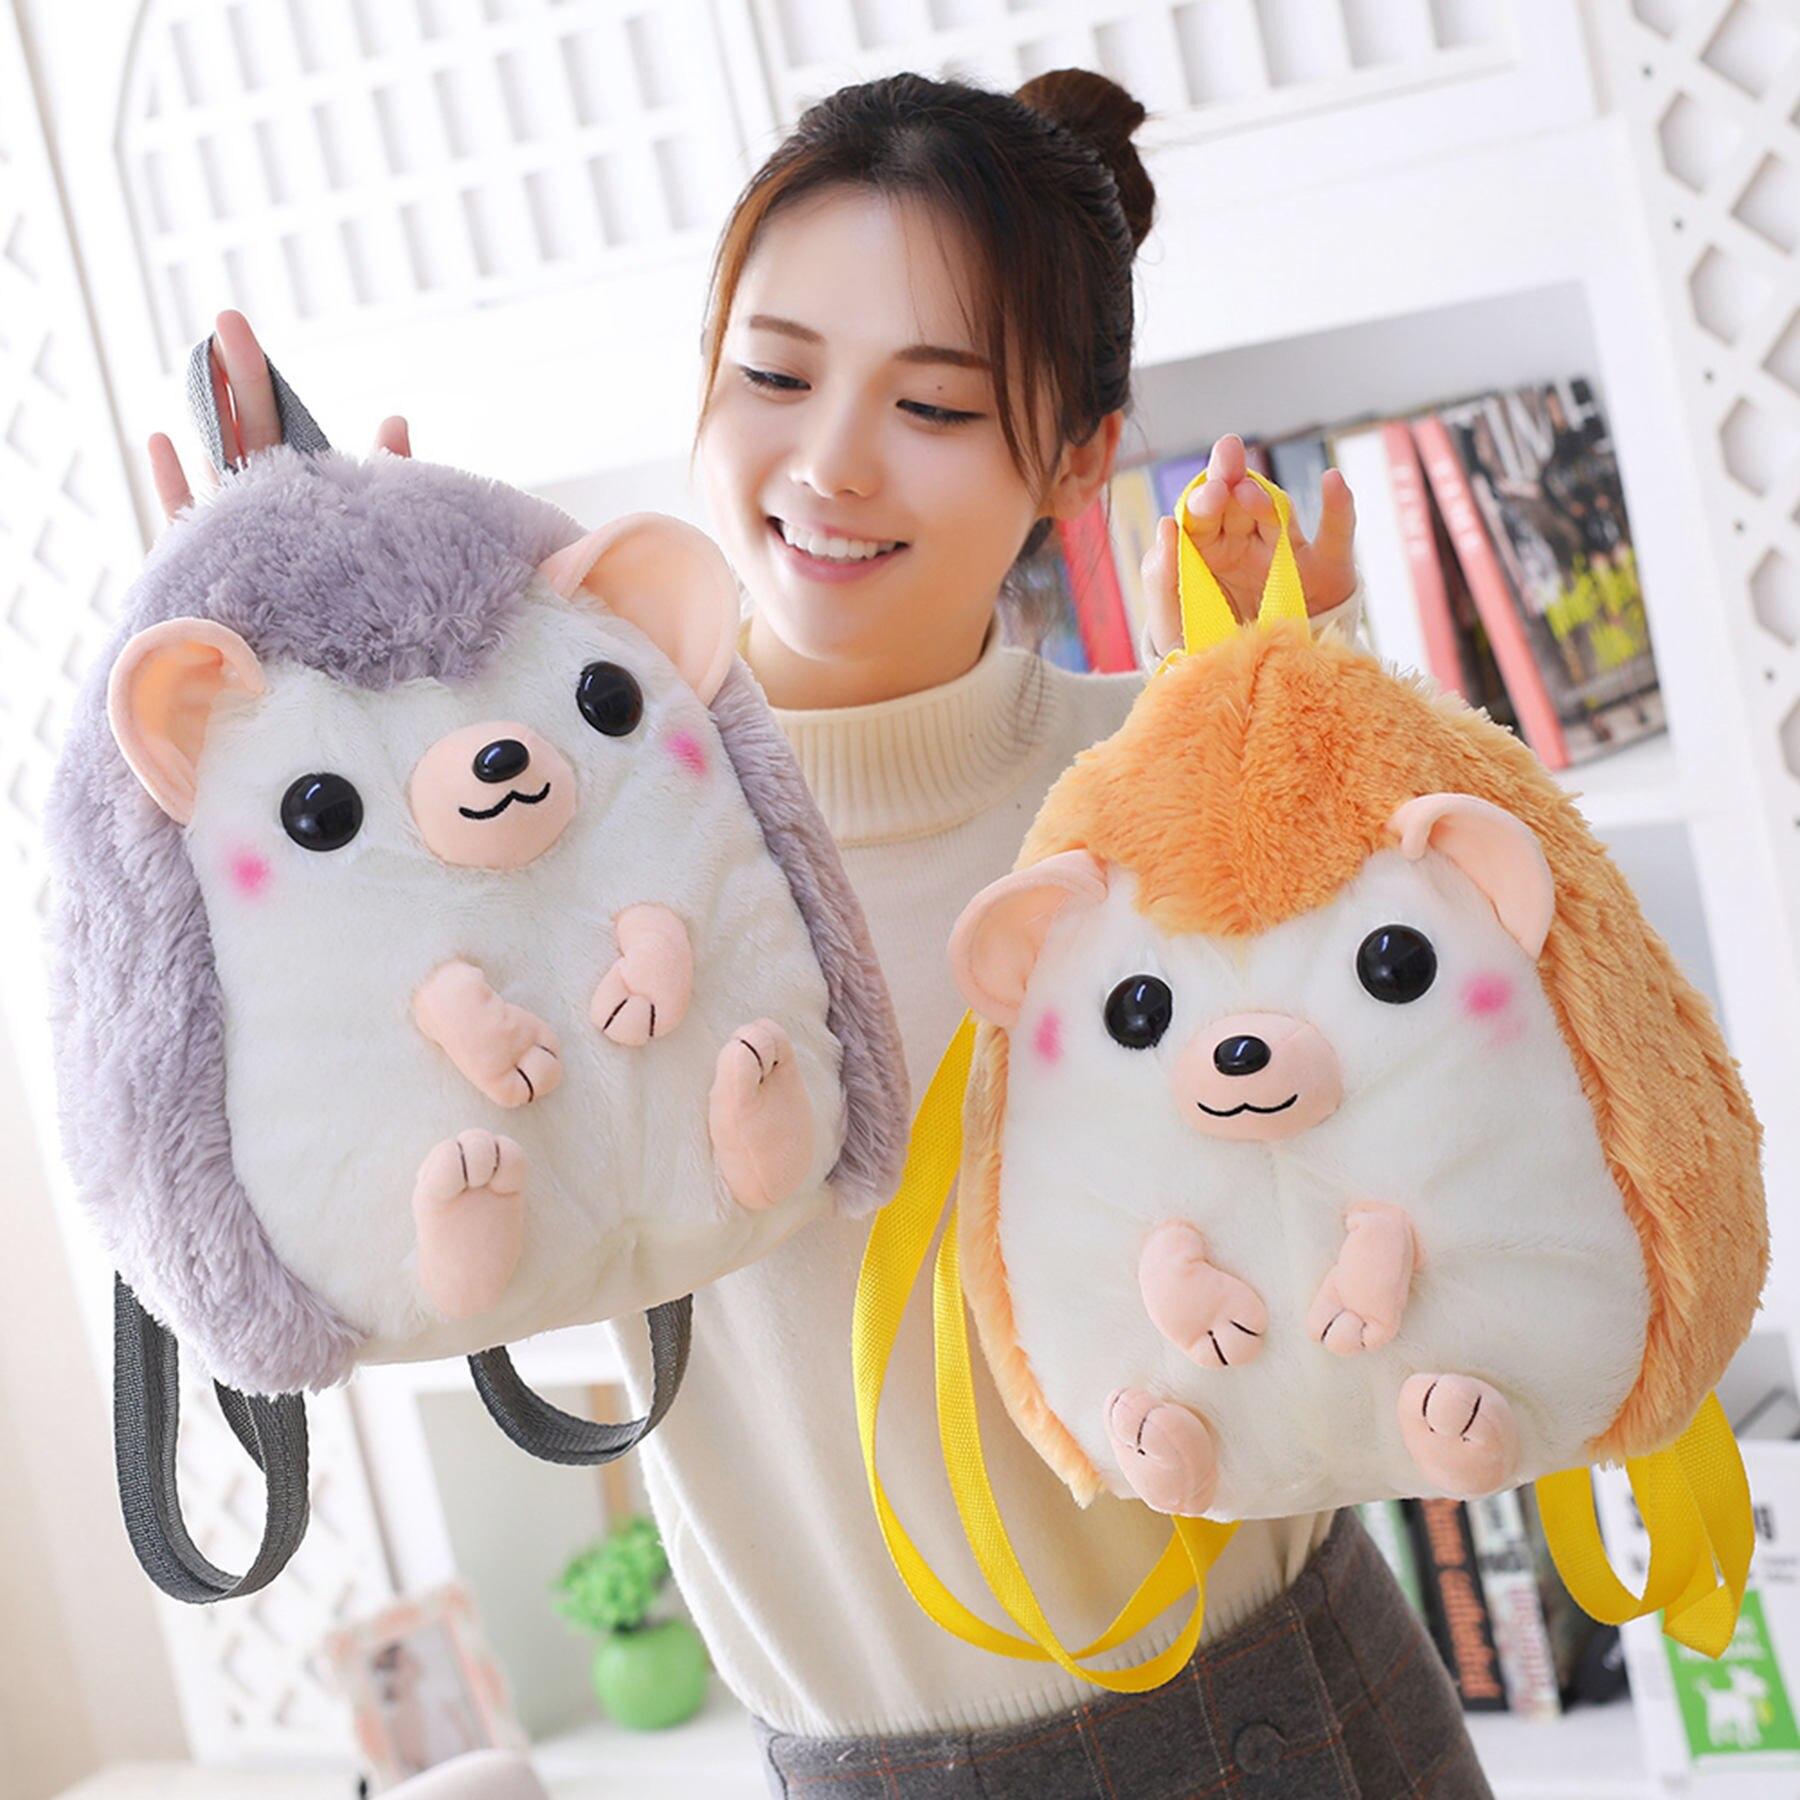 Kawaii Plush Bookback Stuffed Animal Hedgehog Backpacks Toys Knapsack For Kids Cartoon Animal Plushie Bags For Girl Kids